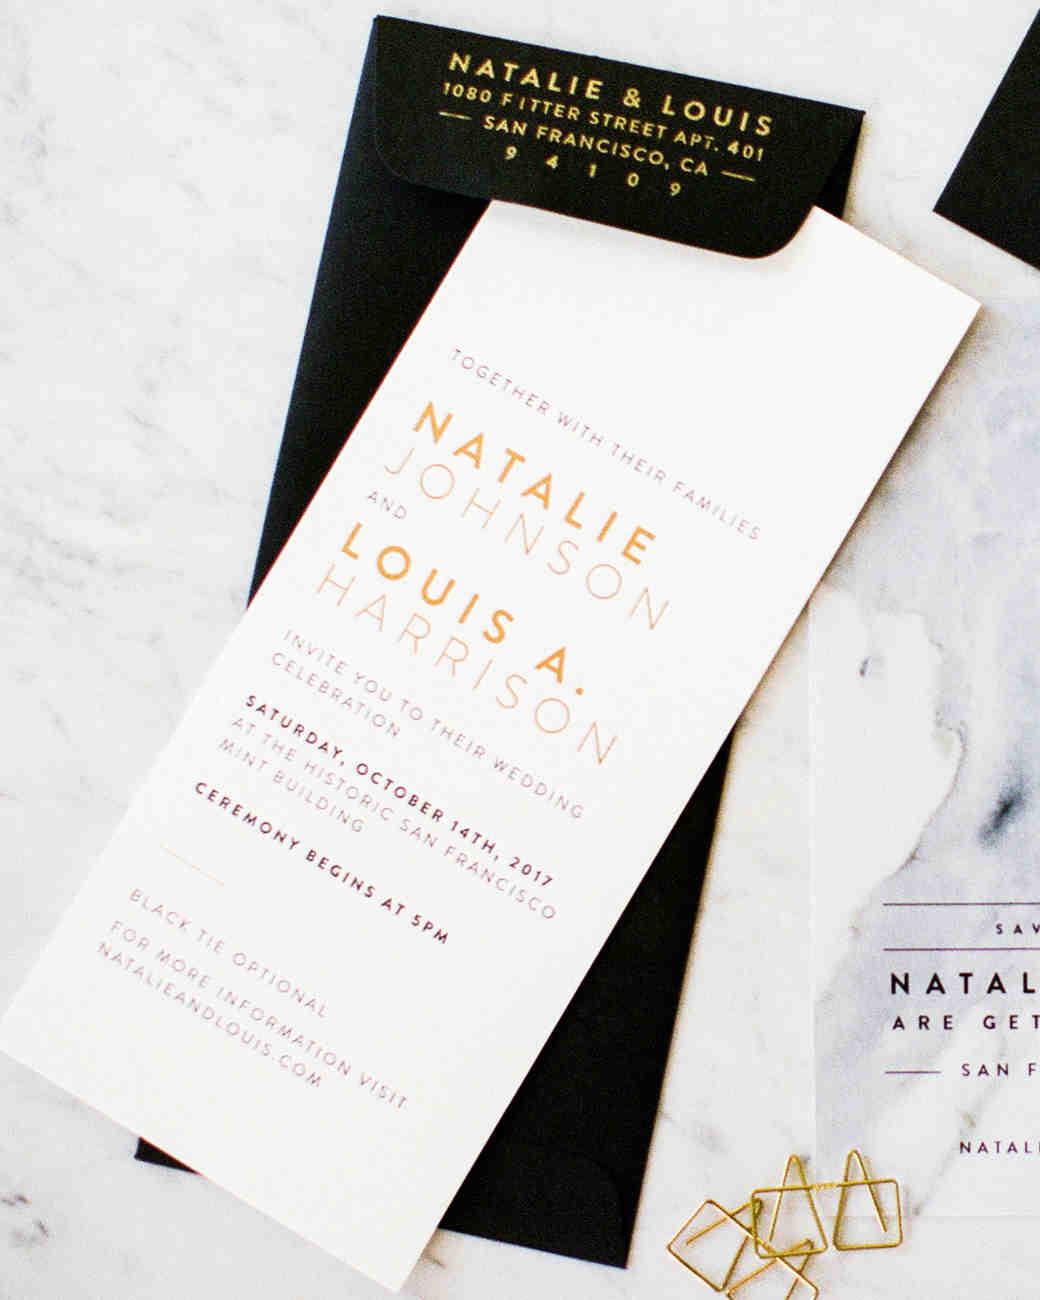 natalie louis wedding invitation